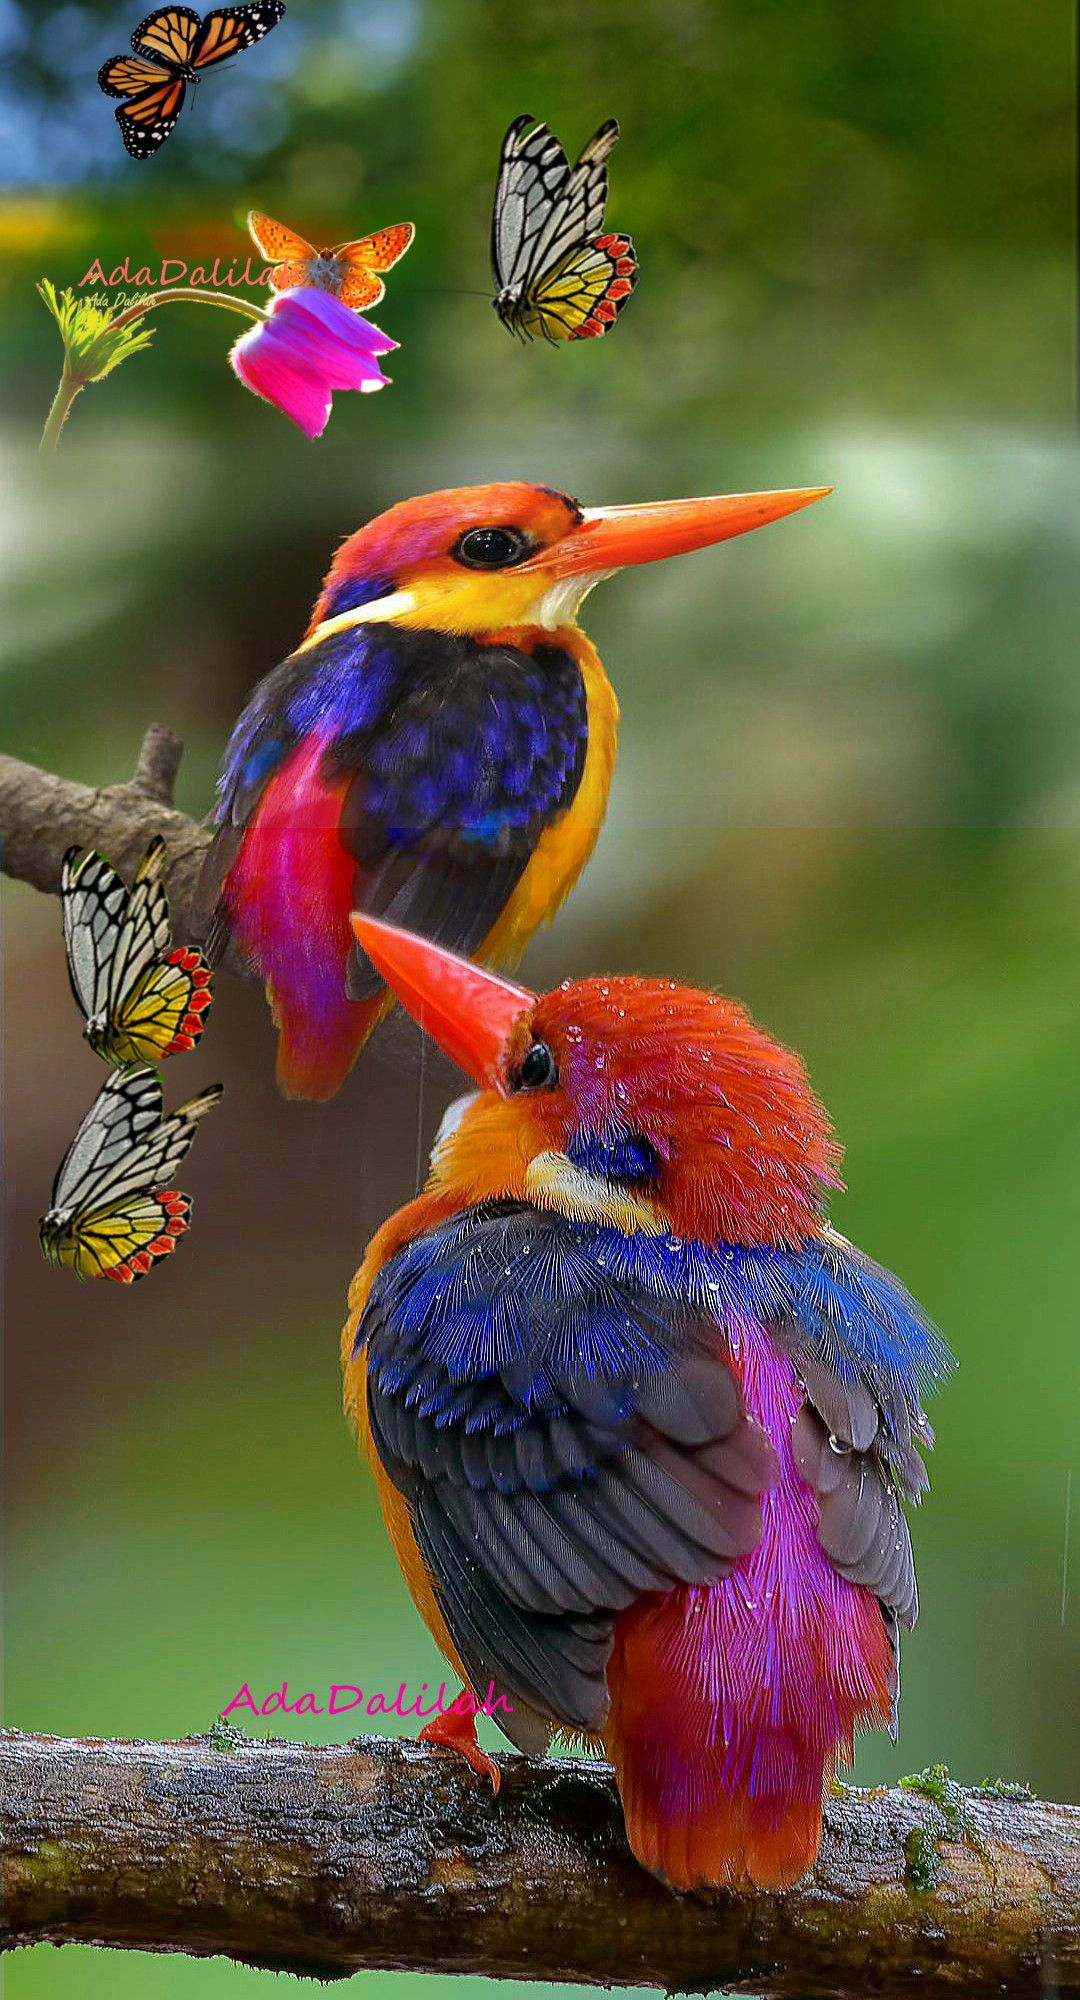 Pin By Aleemsamiul On Creative Clicks Beautiful Birds Birds Most Beautiful Birds